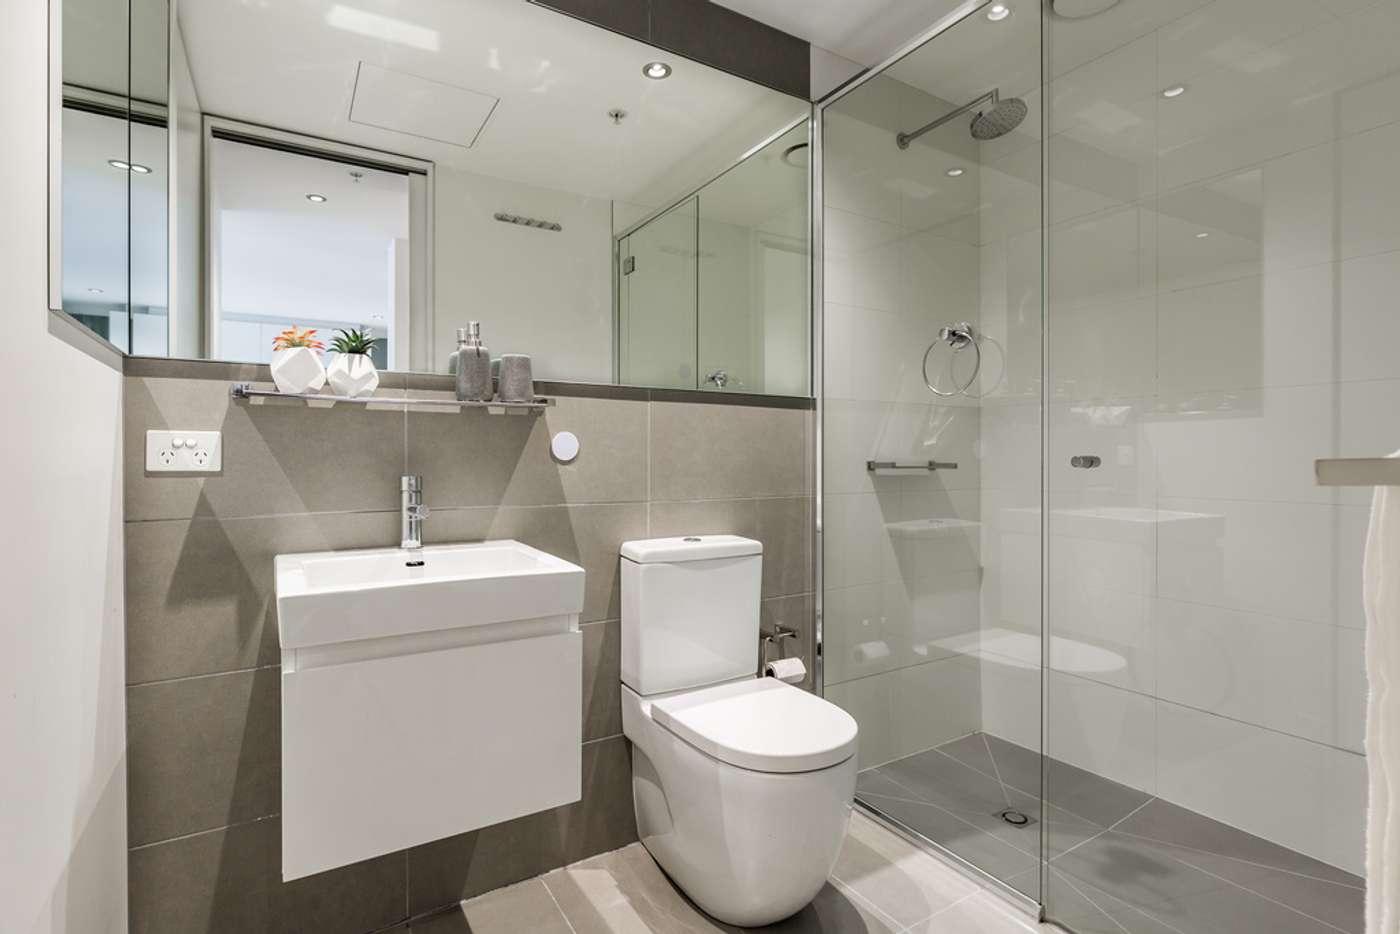 Sixth view of Homely apartment listing, 901/770B Toorak Road, Glen Iris VIC 3146